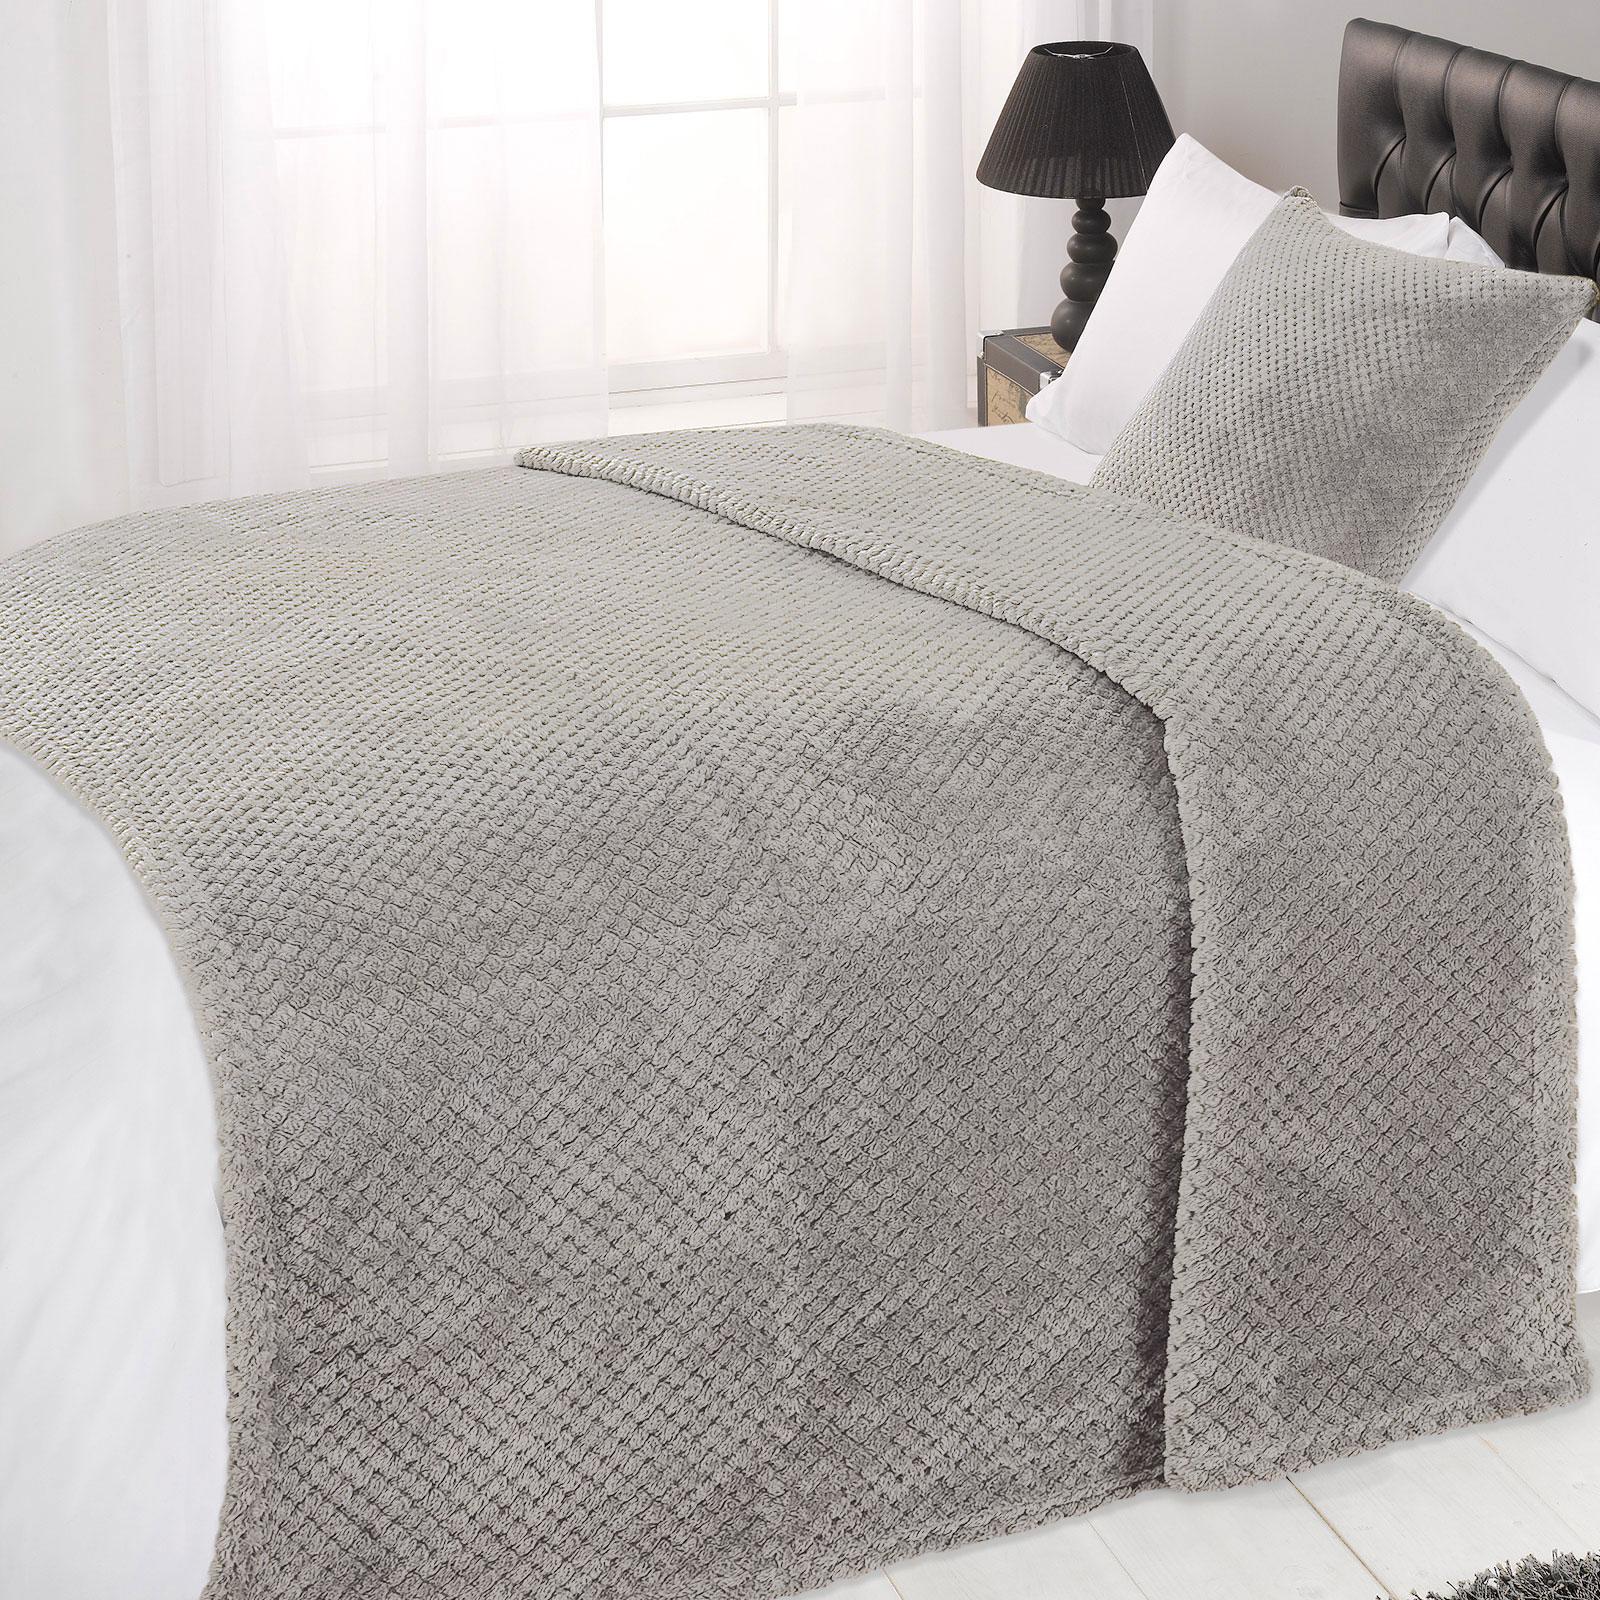 white company sofa throws seat sf cinema dreamscene luxury large waffle honeycomb mink warm throw